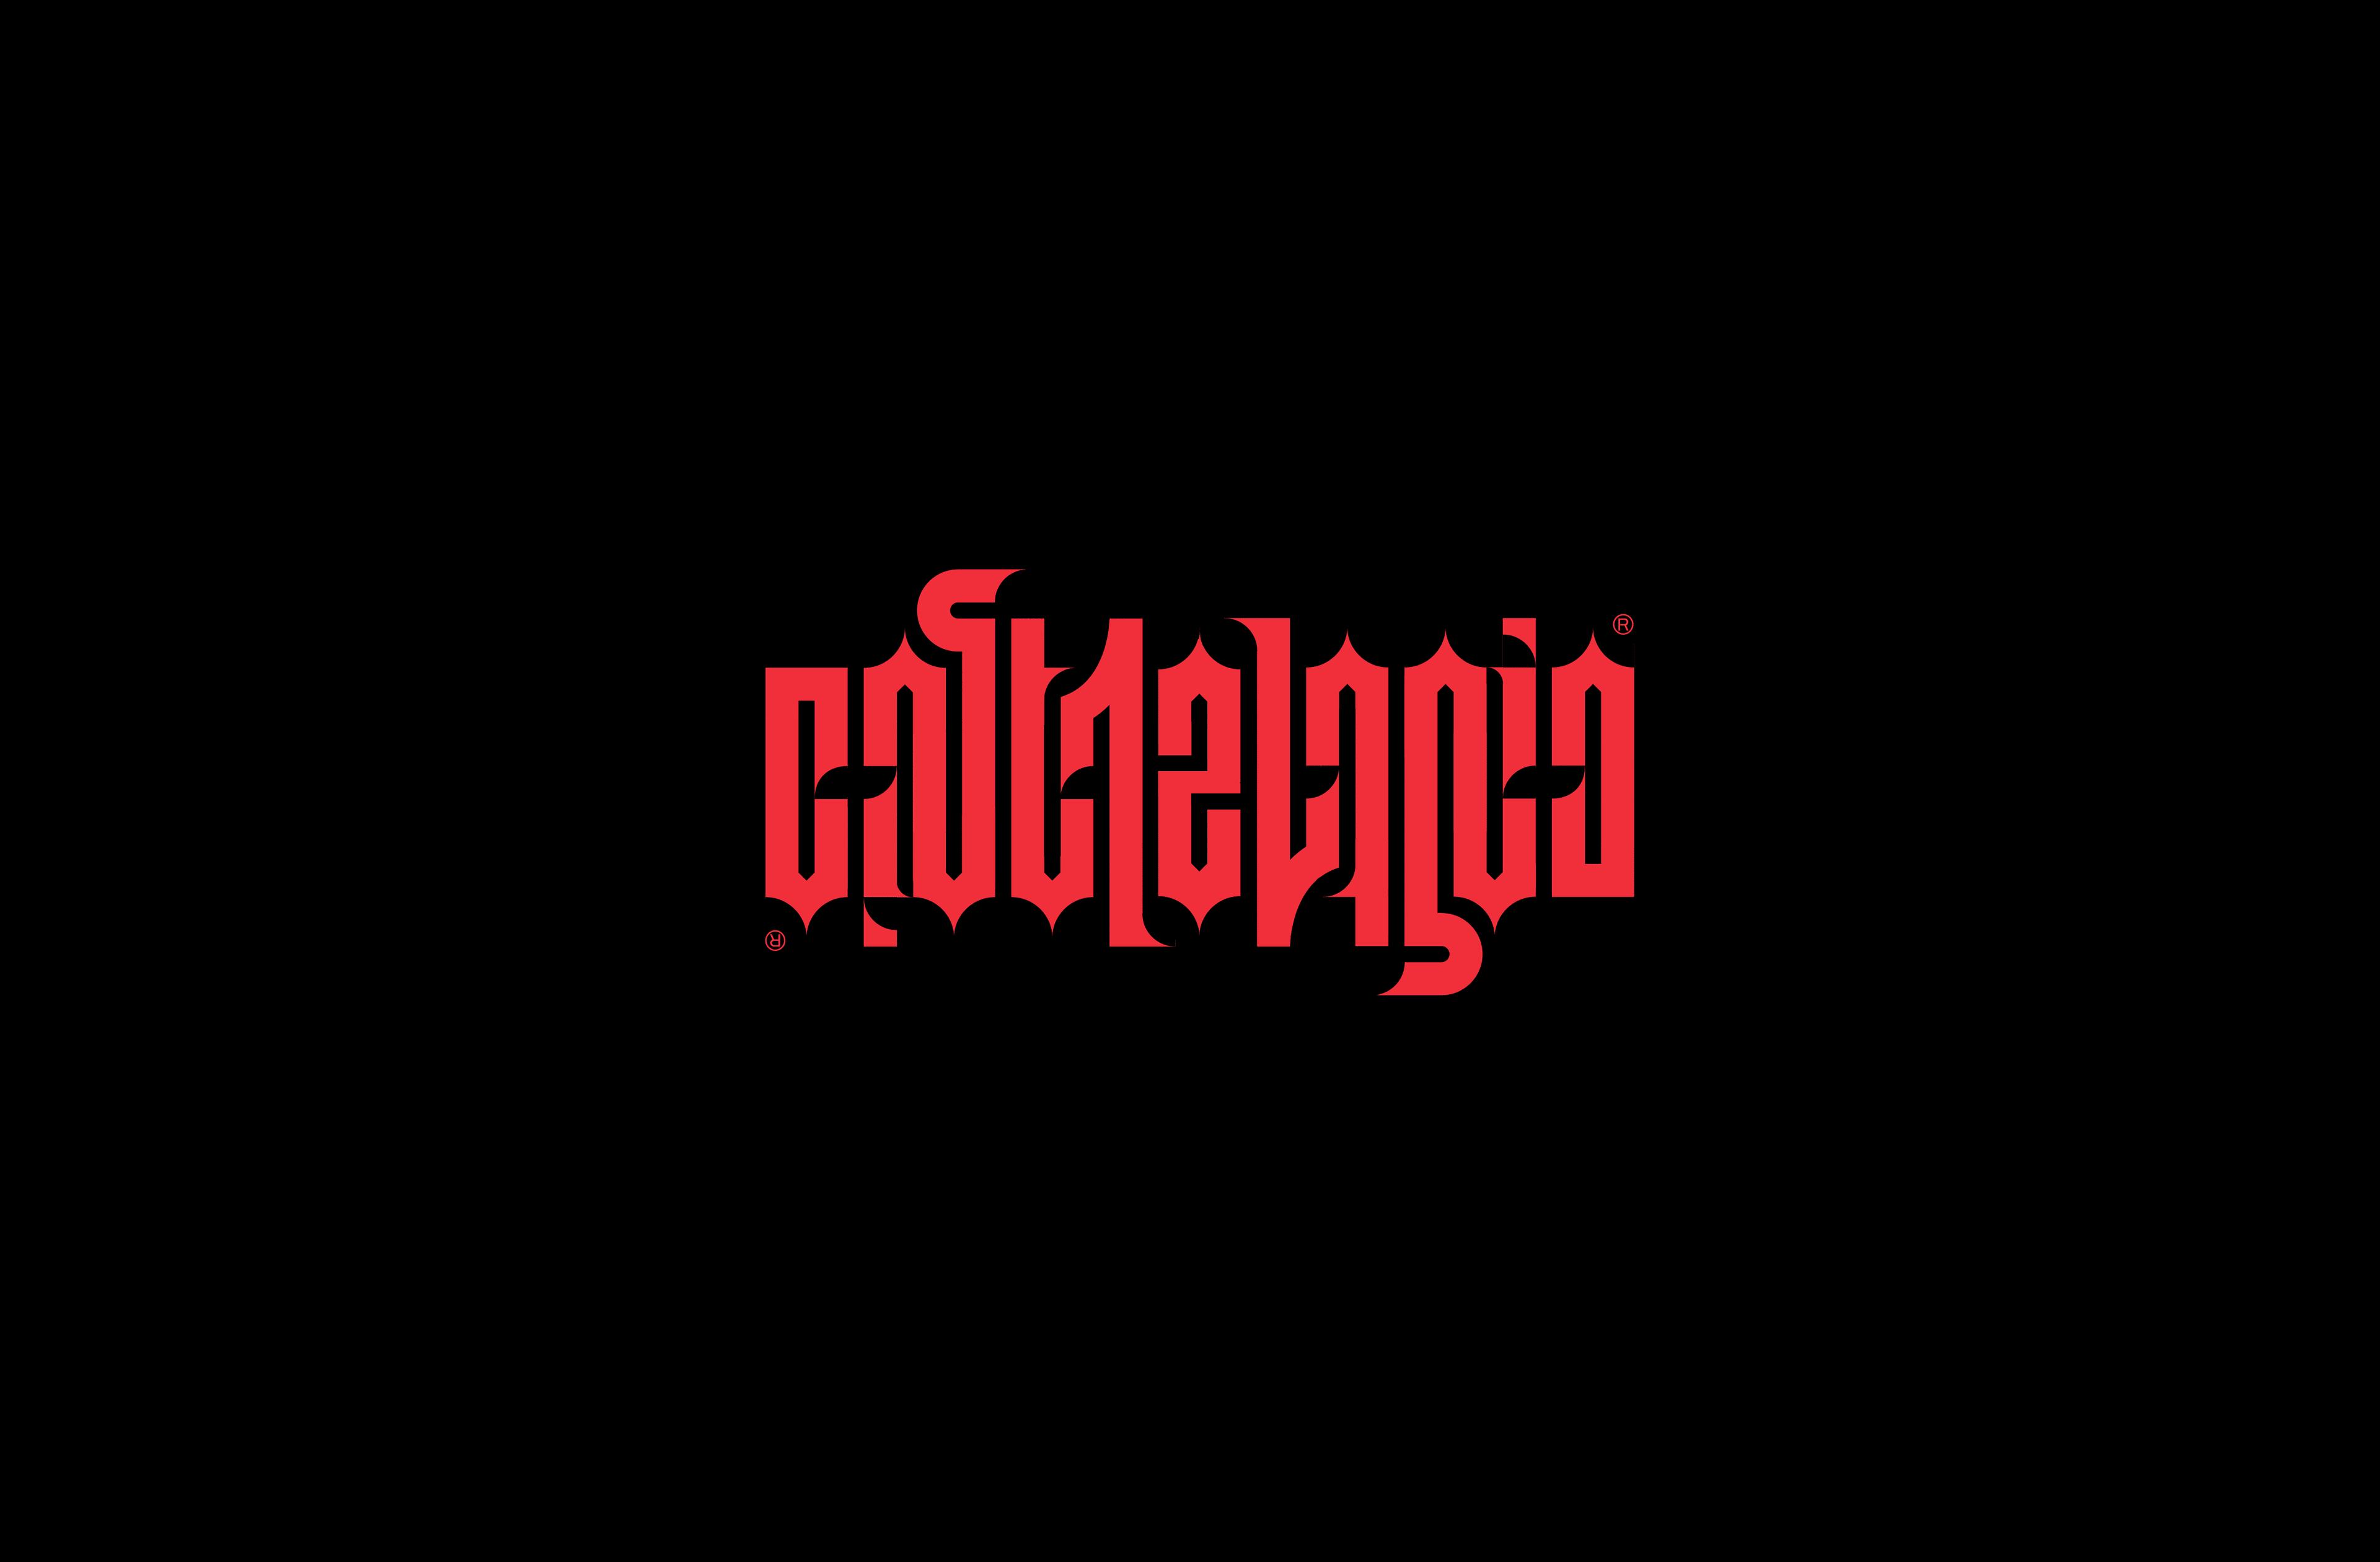 Castlevania — Ambigram [Concept]